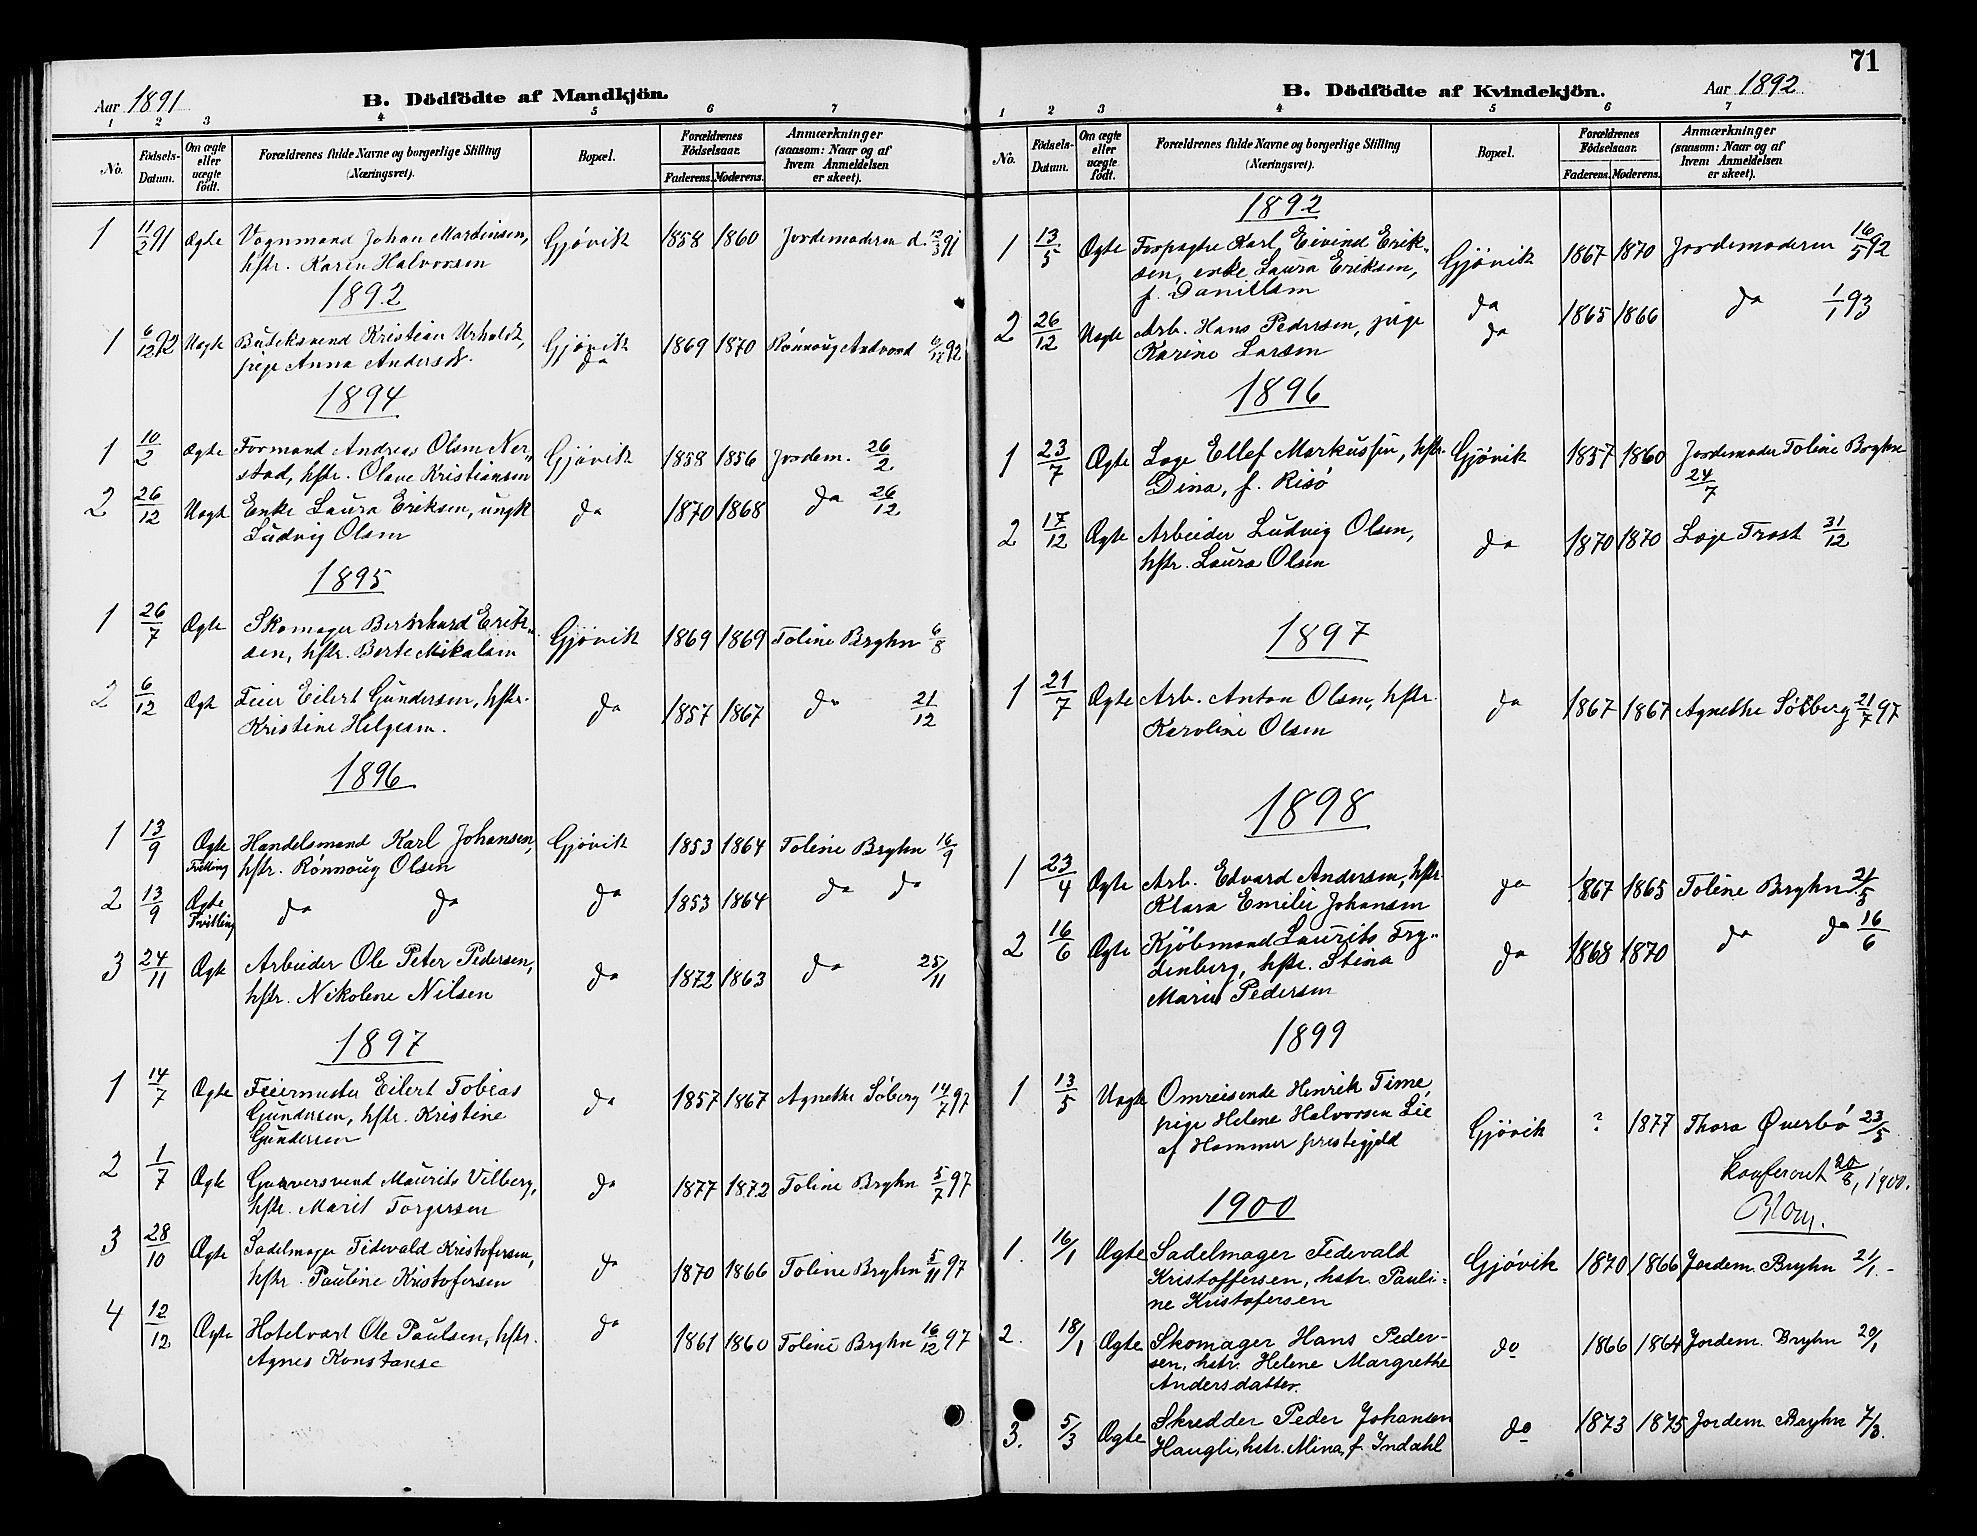 SAH, Vardal prestekontor, H/Ha/Hab/L0009: Klokkerbok nr. 9, 1894-1902, s. 71